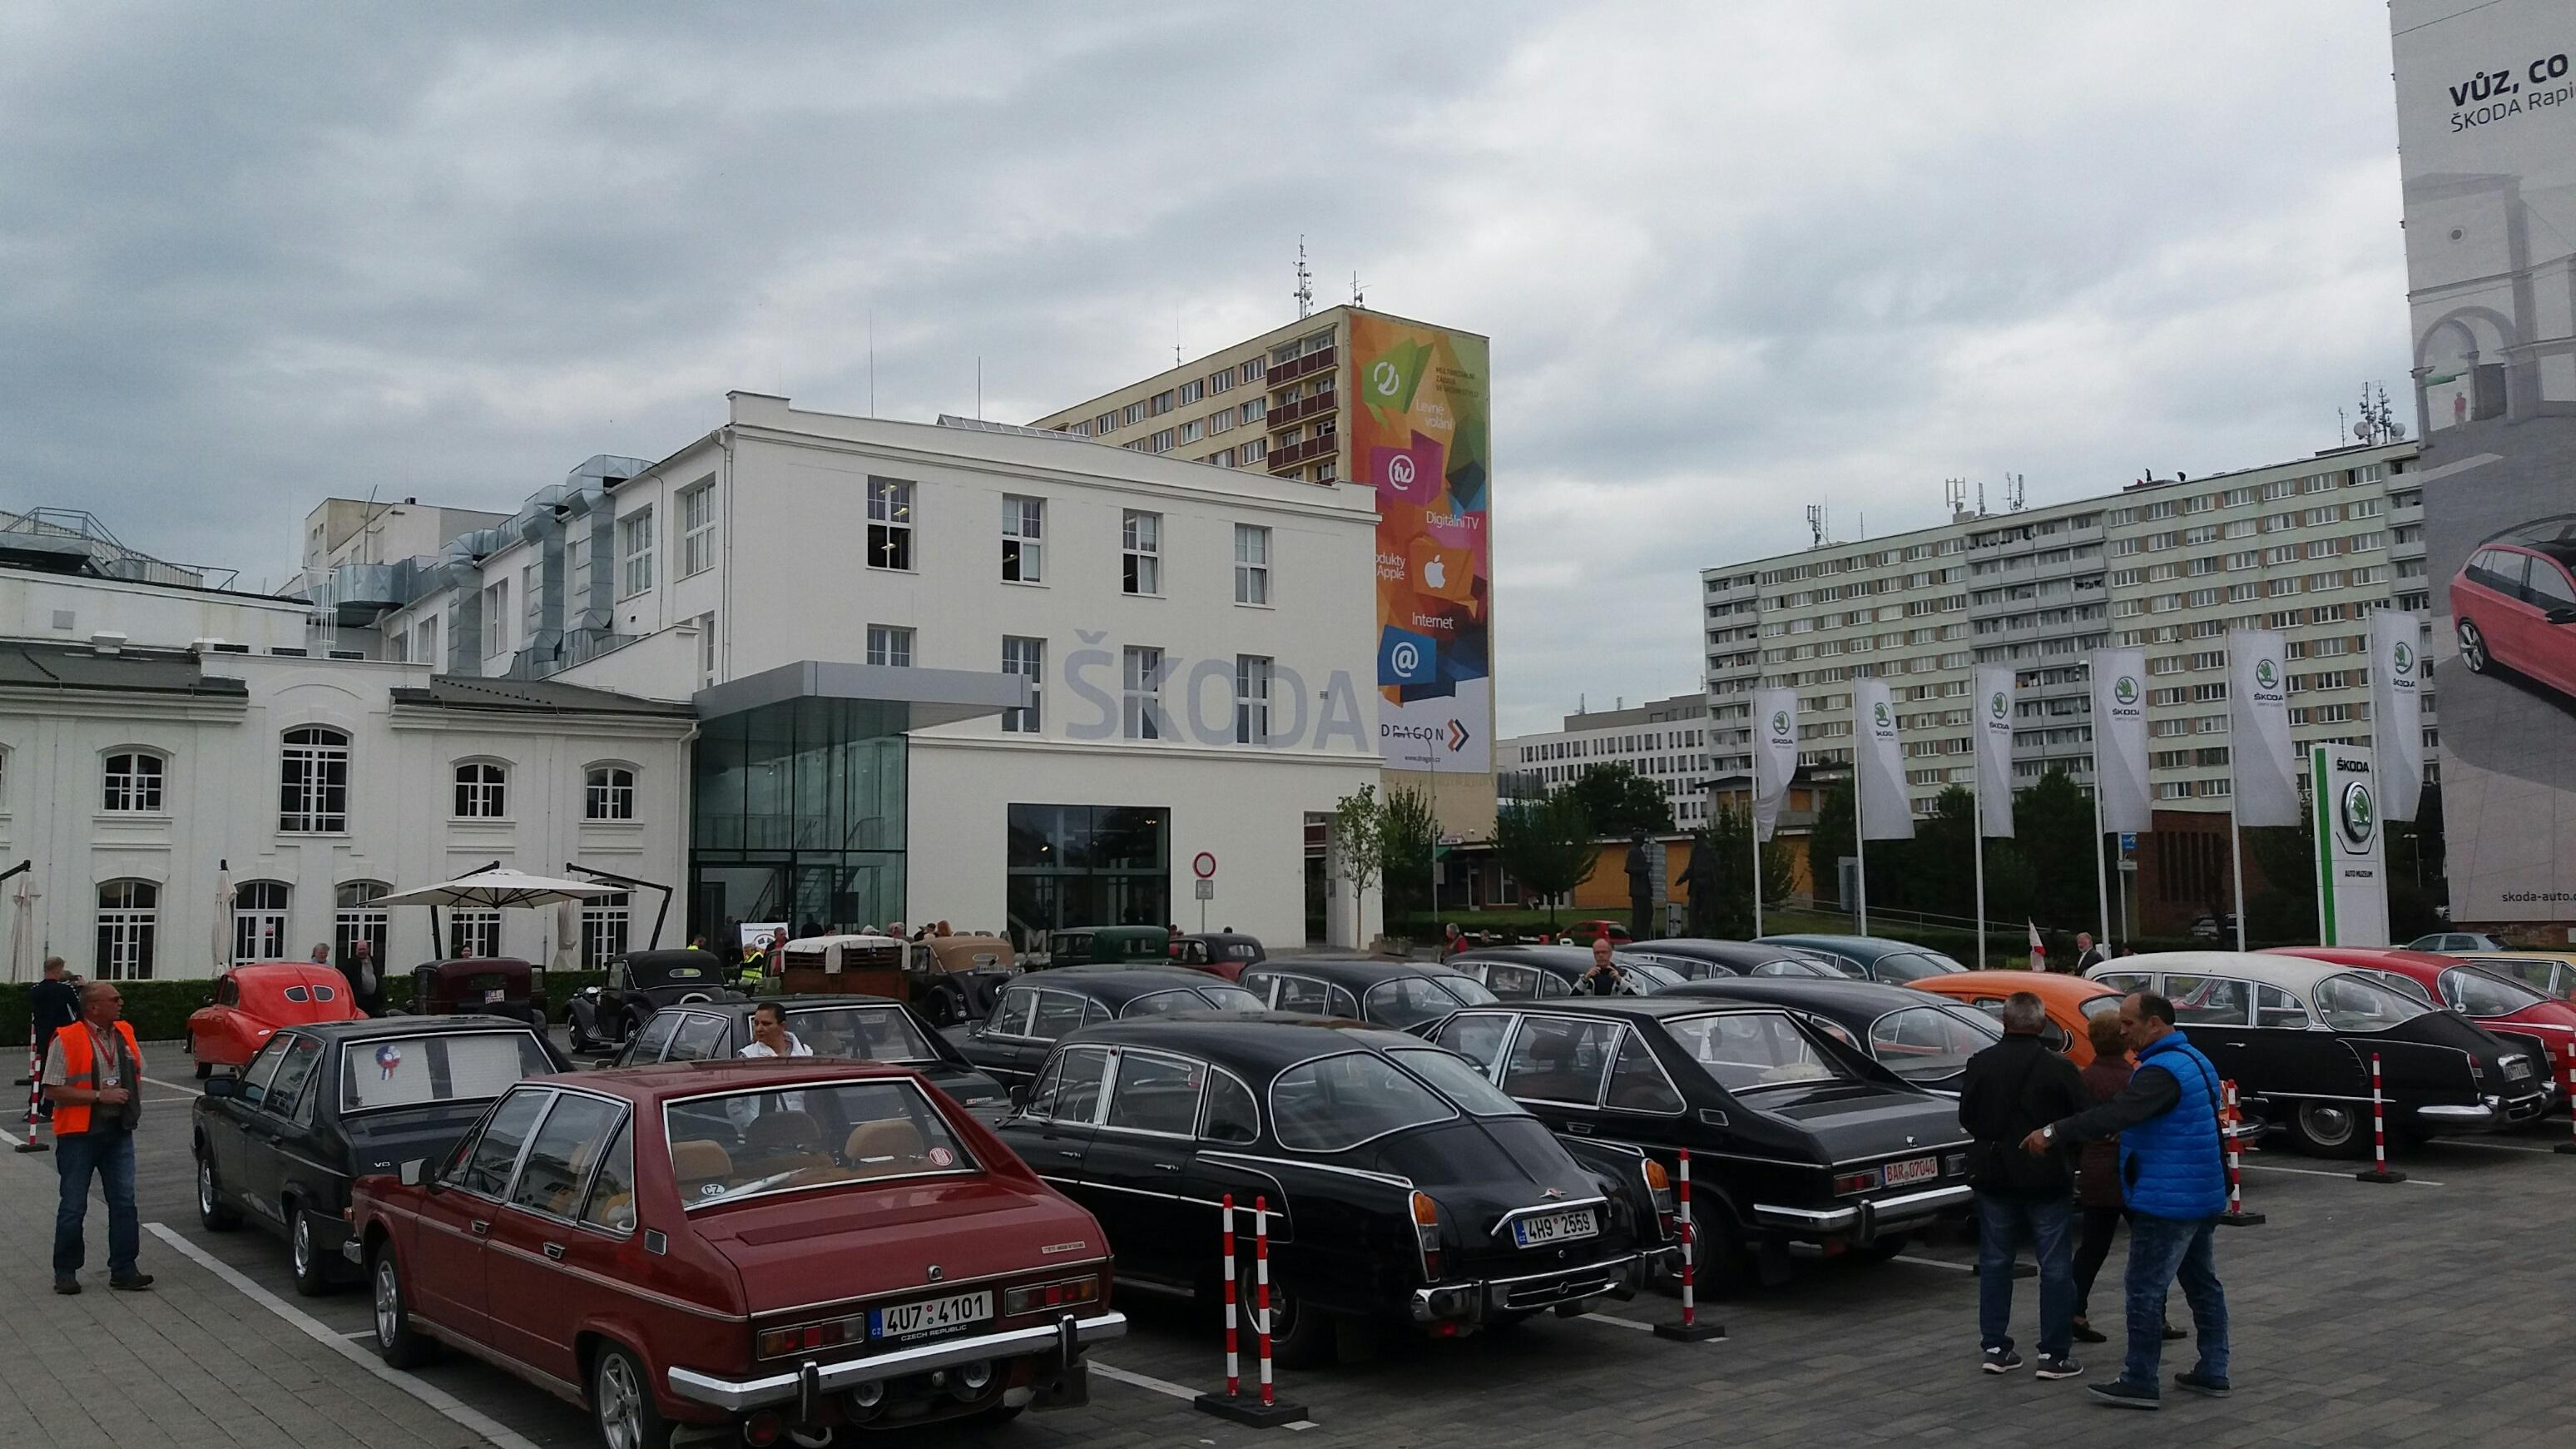 SkodaMuseum